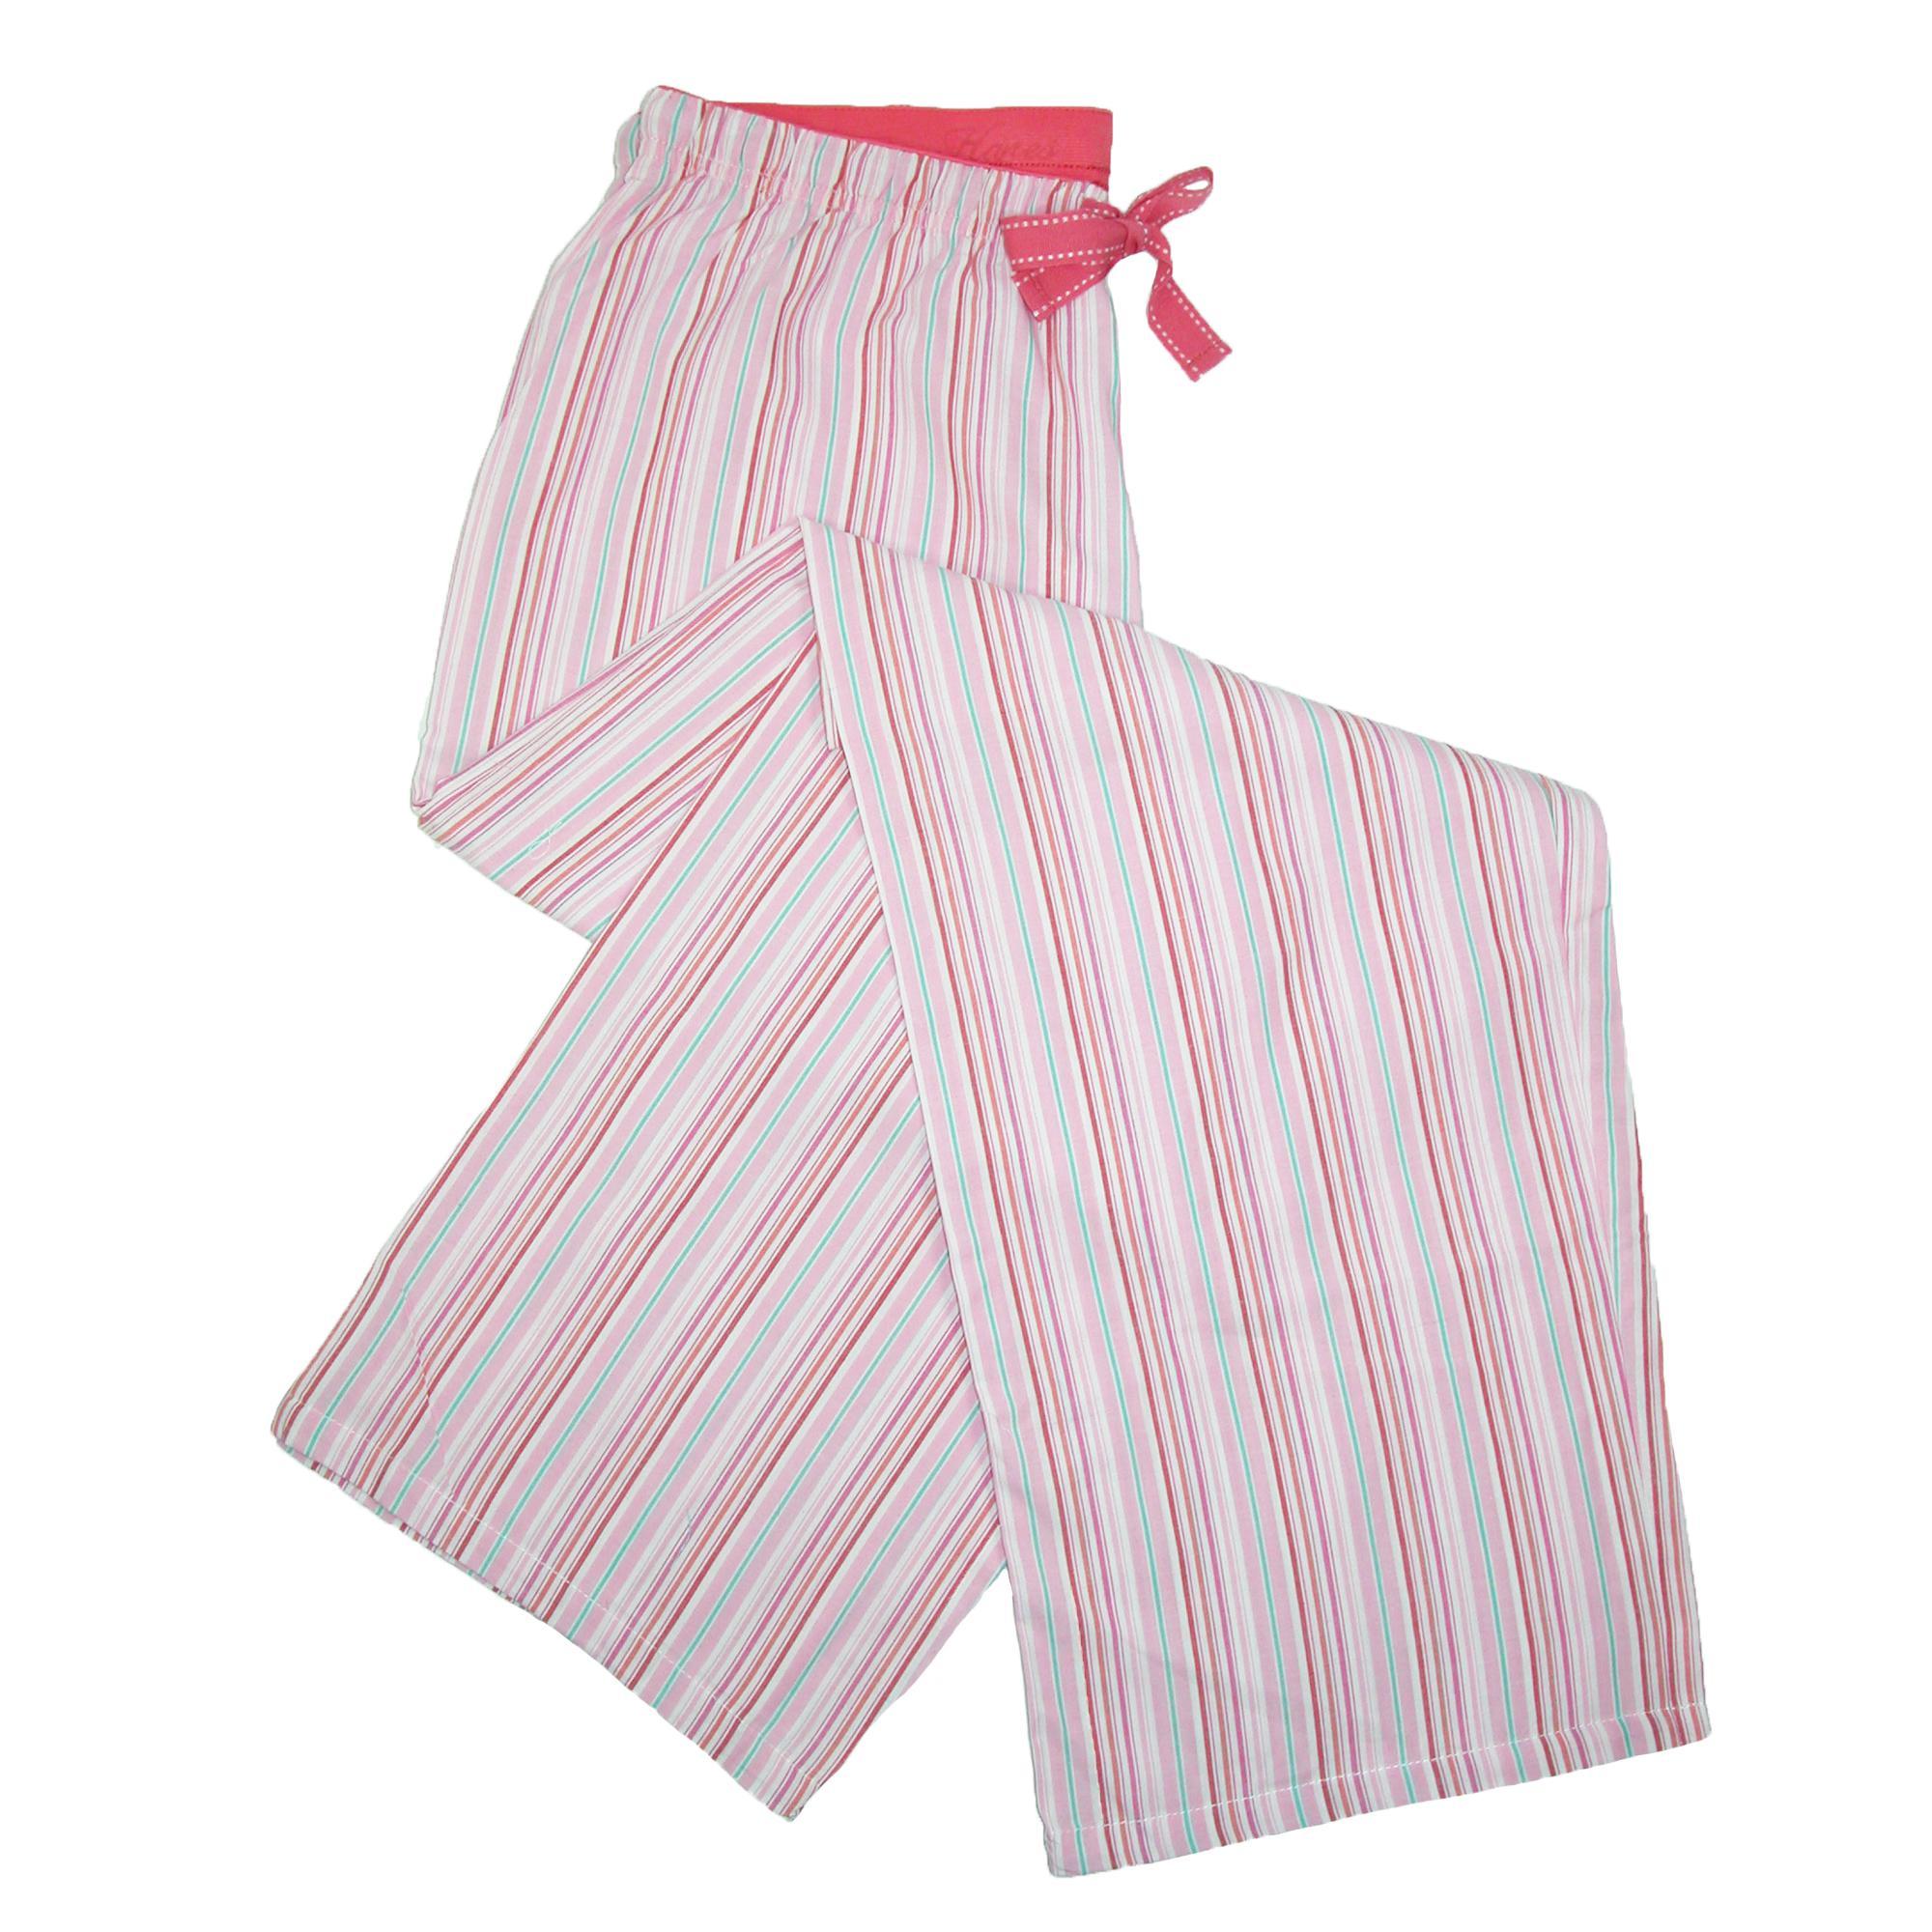 New Aliexpress.com  Buy Hot Sale Women Cotton Pants 2016 Spring Fashion Women Pants Slim Pencil ...